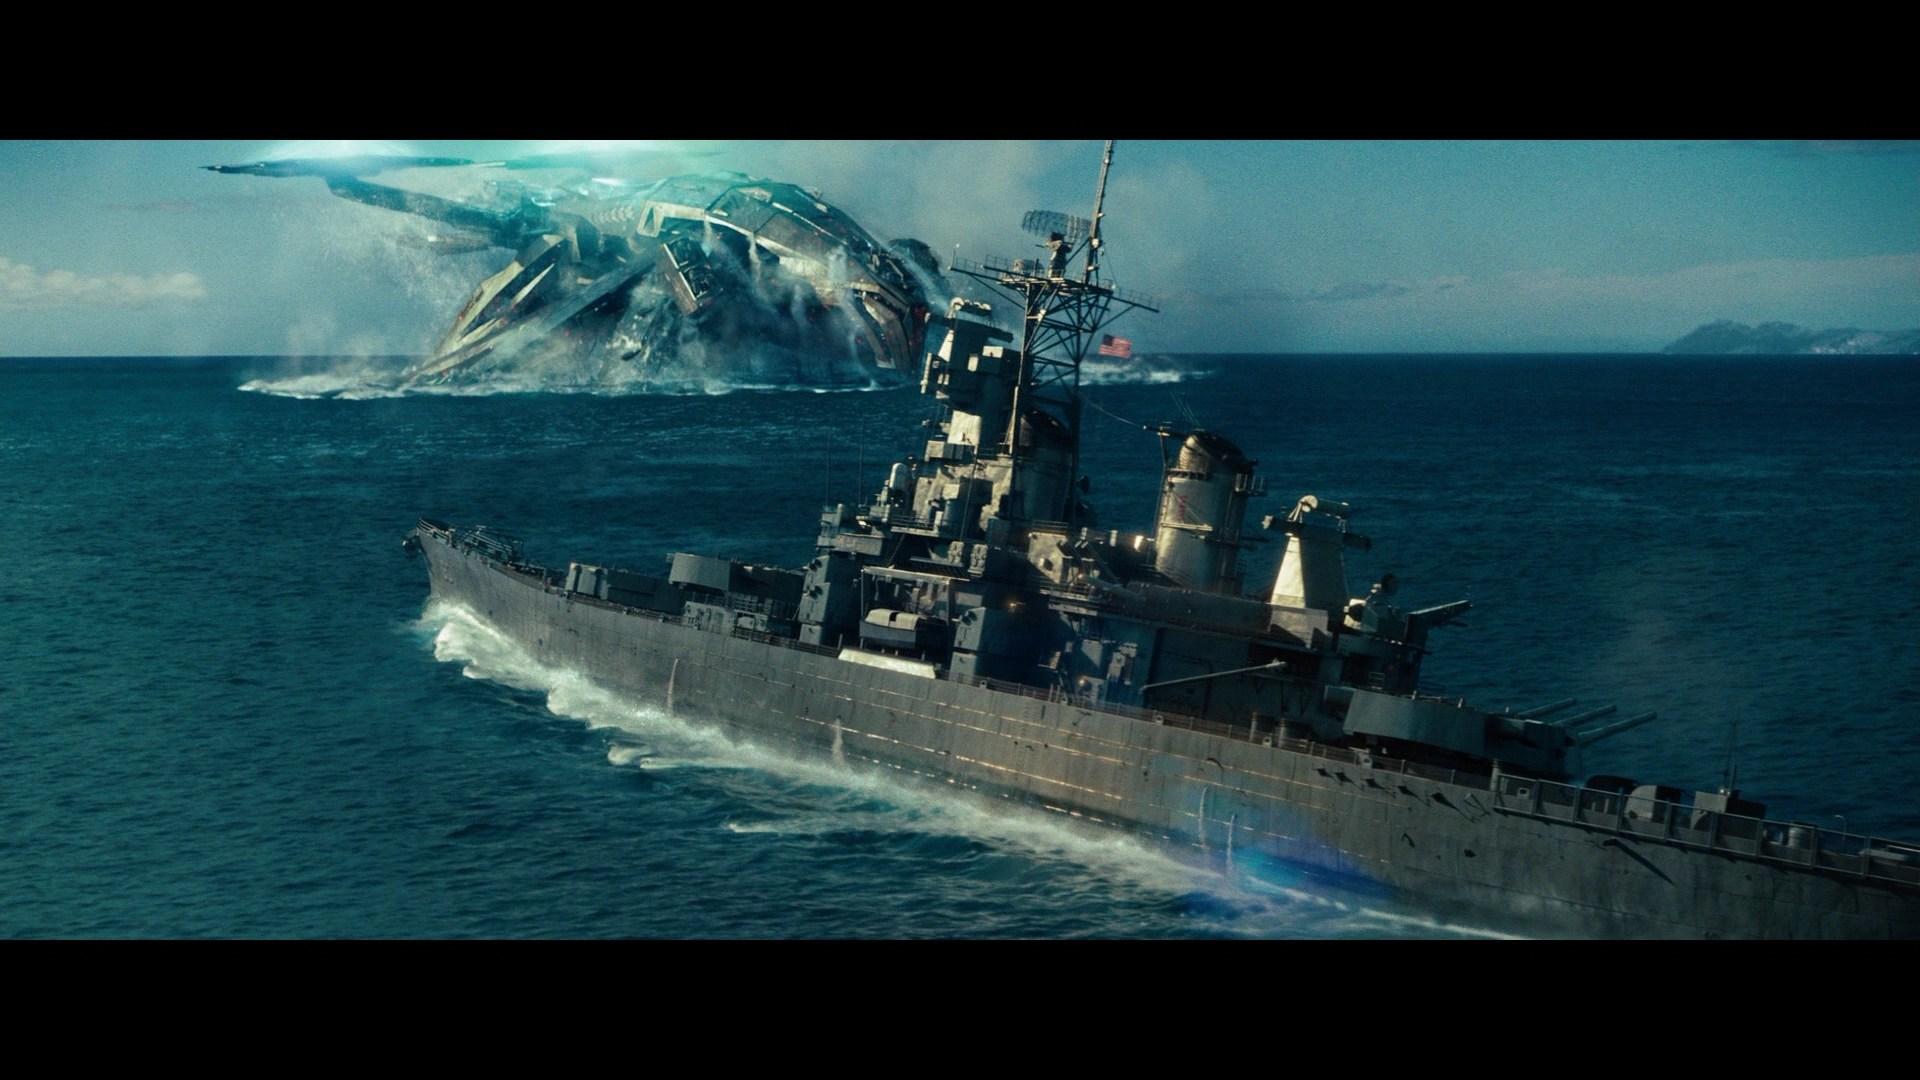 Justice League Hd Wallpaper Uss Missouri Battleship Wiki Fandom Powered By Wikia